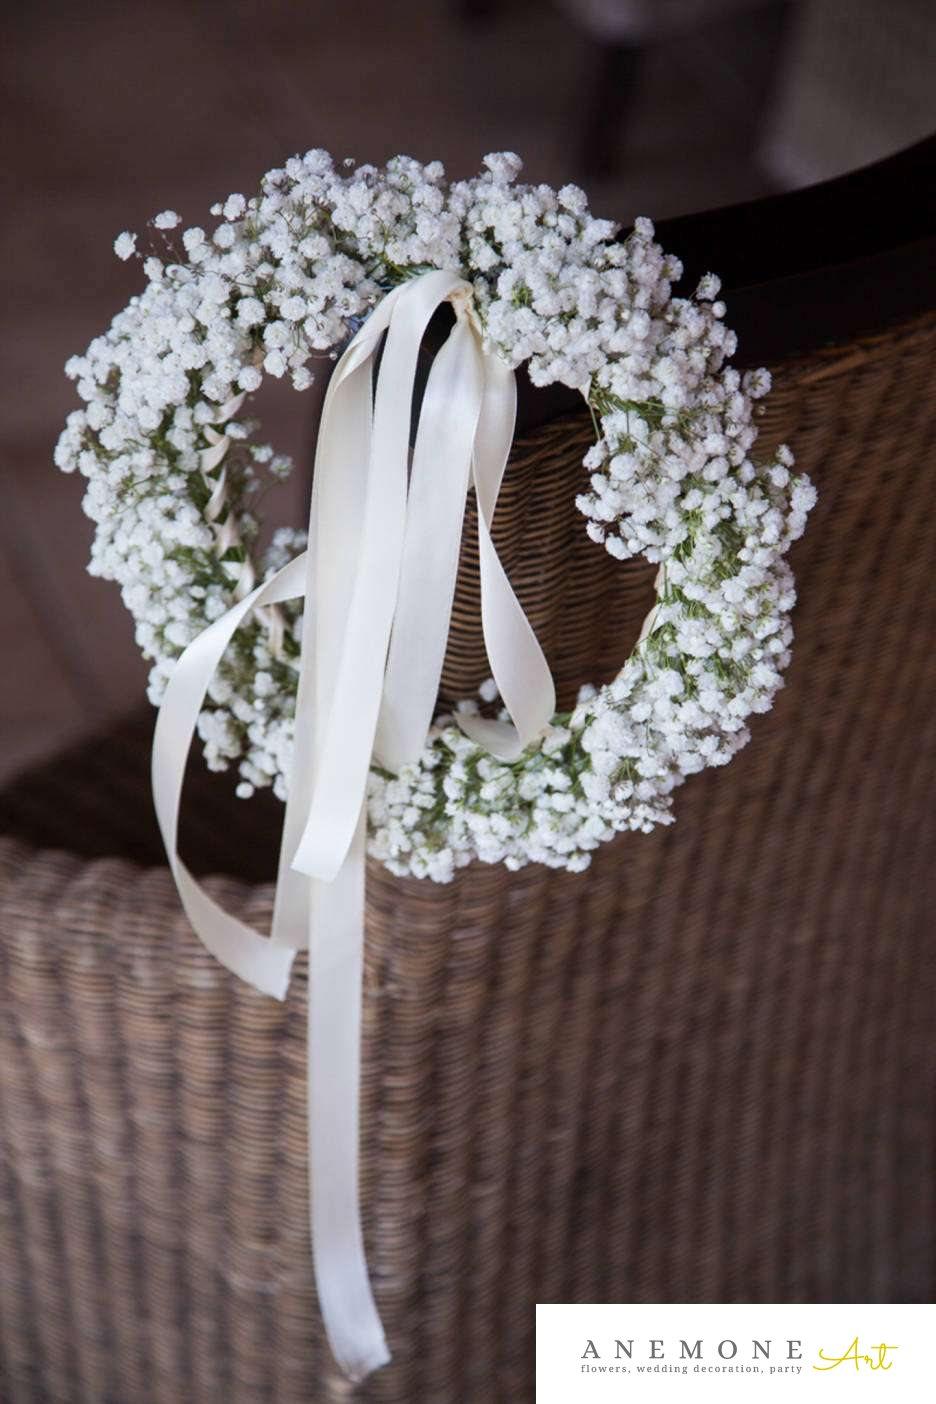 Poza, foto cu Flori de nunta alb, coronita, gipsofila in Arad, Timisoara, Oradea (wedding flowers, bouquets) nunta Arad, Timisoara, Oradea